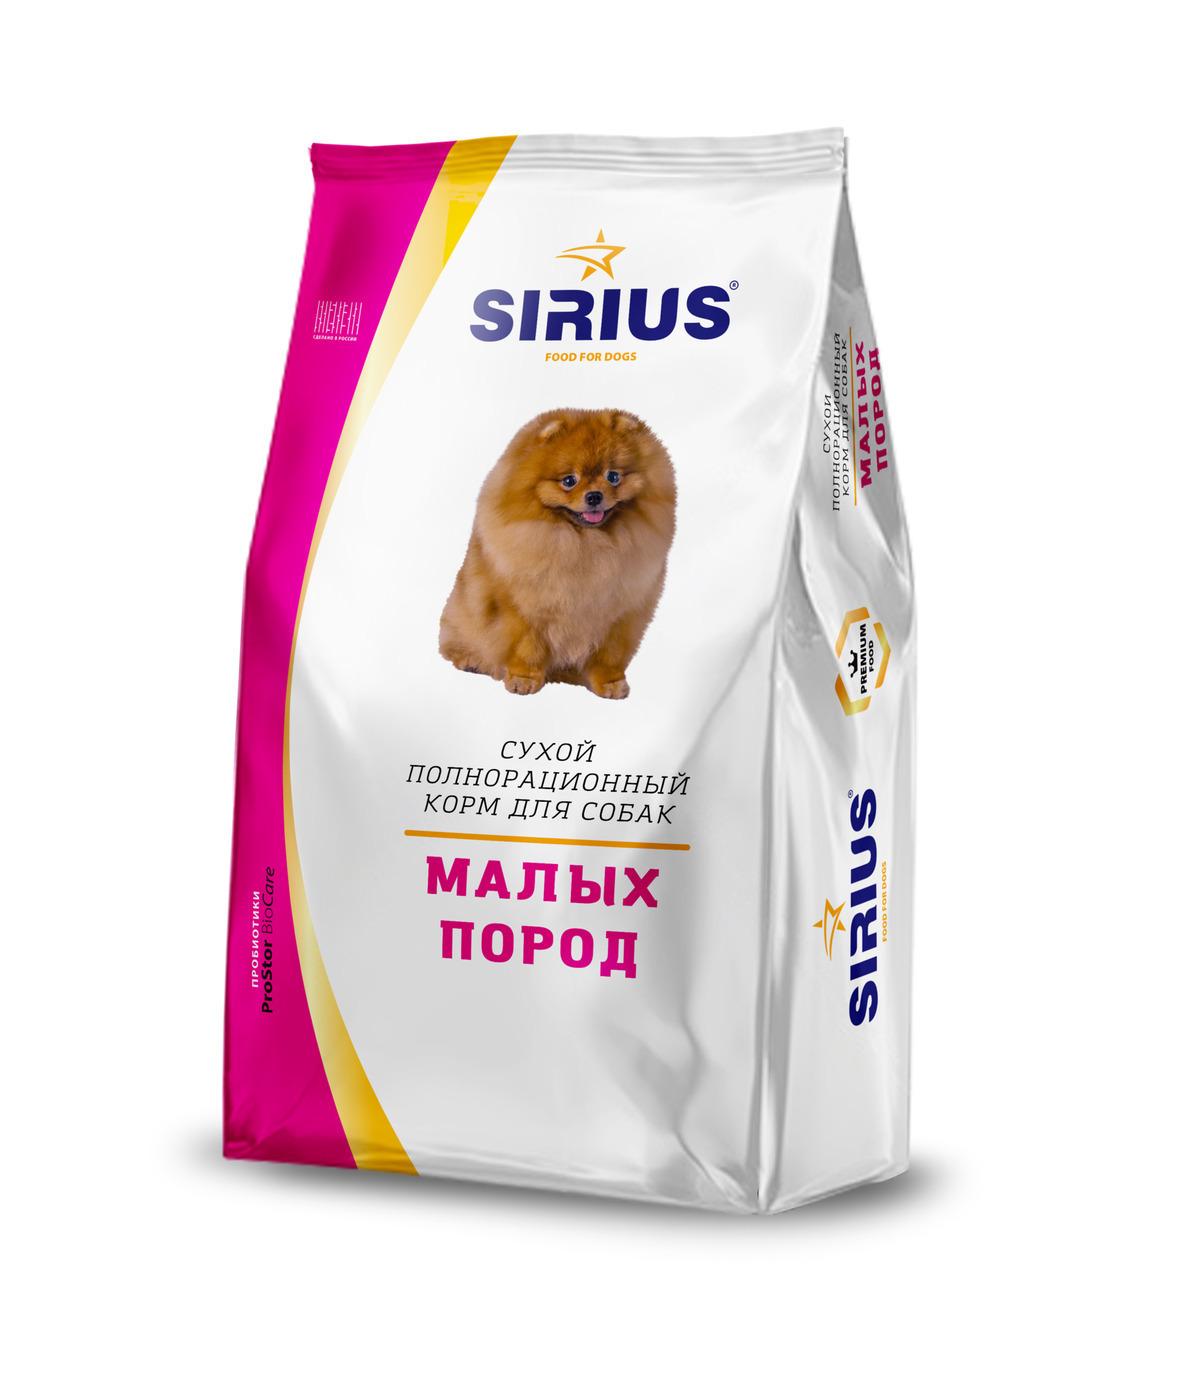 Сухой корм ТМ «SIRIUS» для взрослых собак мелких пород, 10